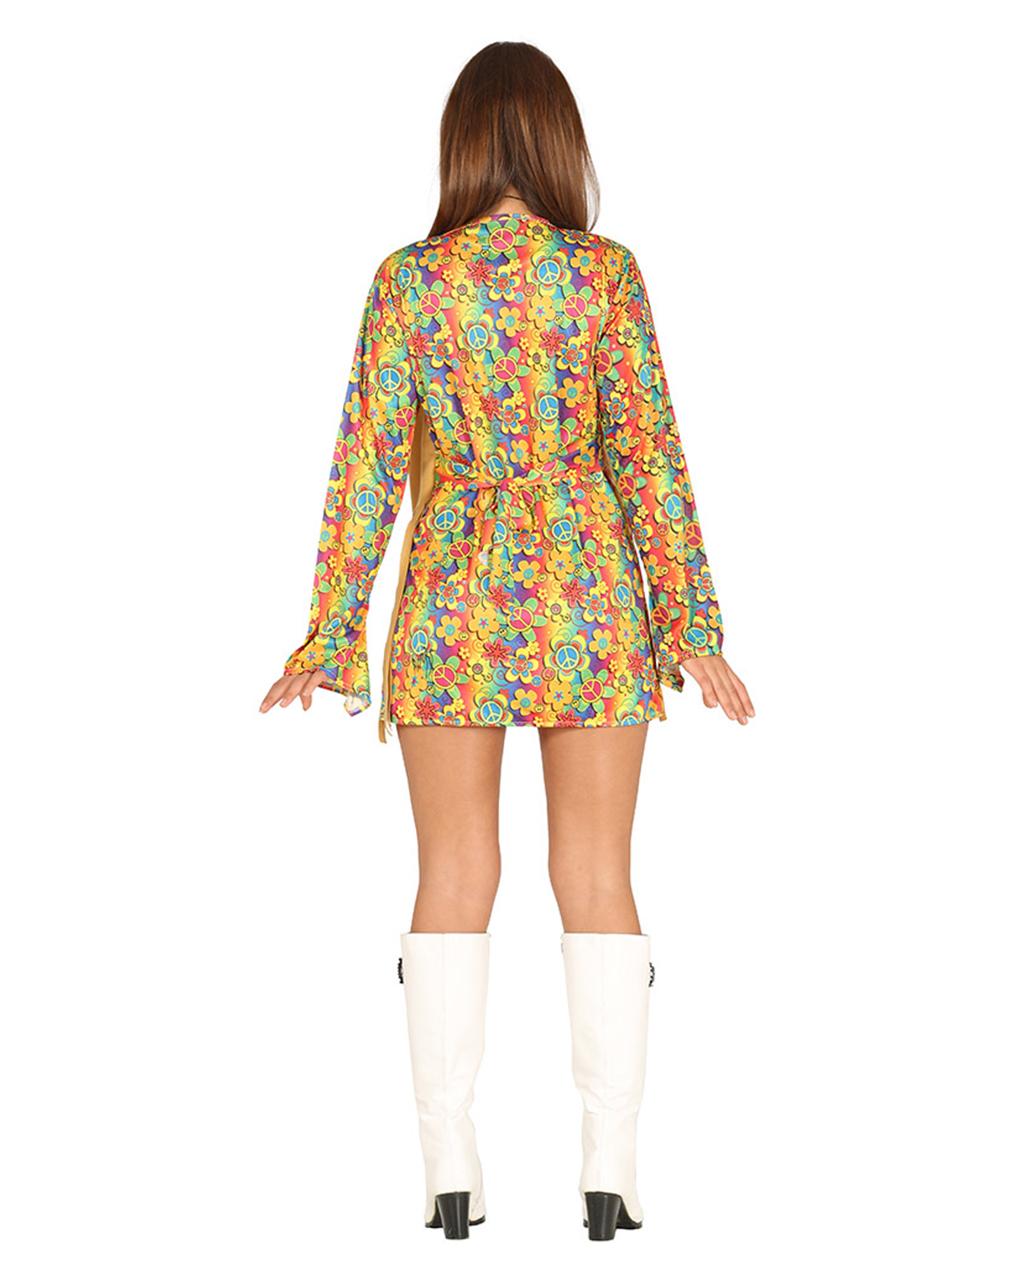 flower power hippie dress allegra costume party horror. Black Bedroom Furniture Sets. Home Design Ideas